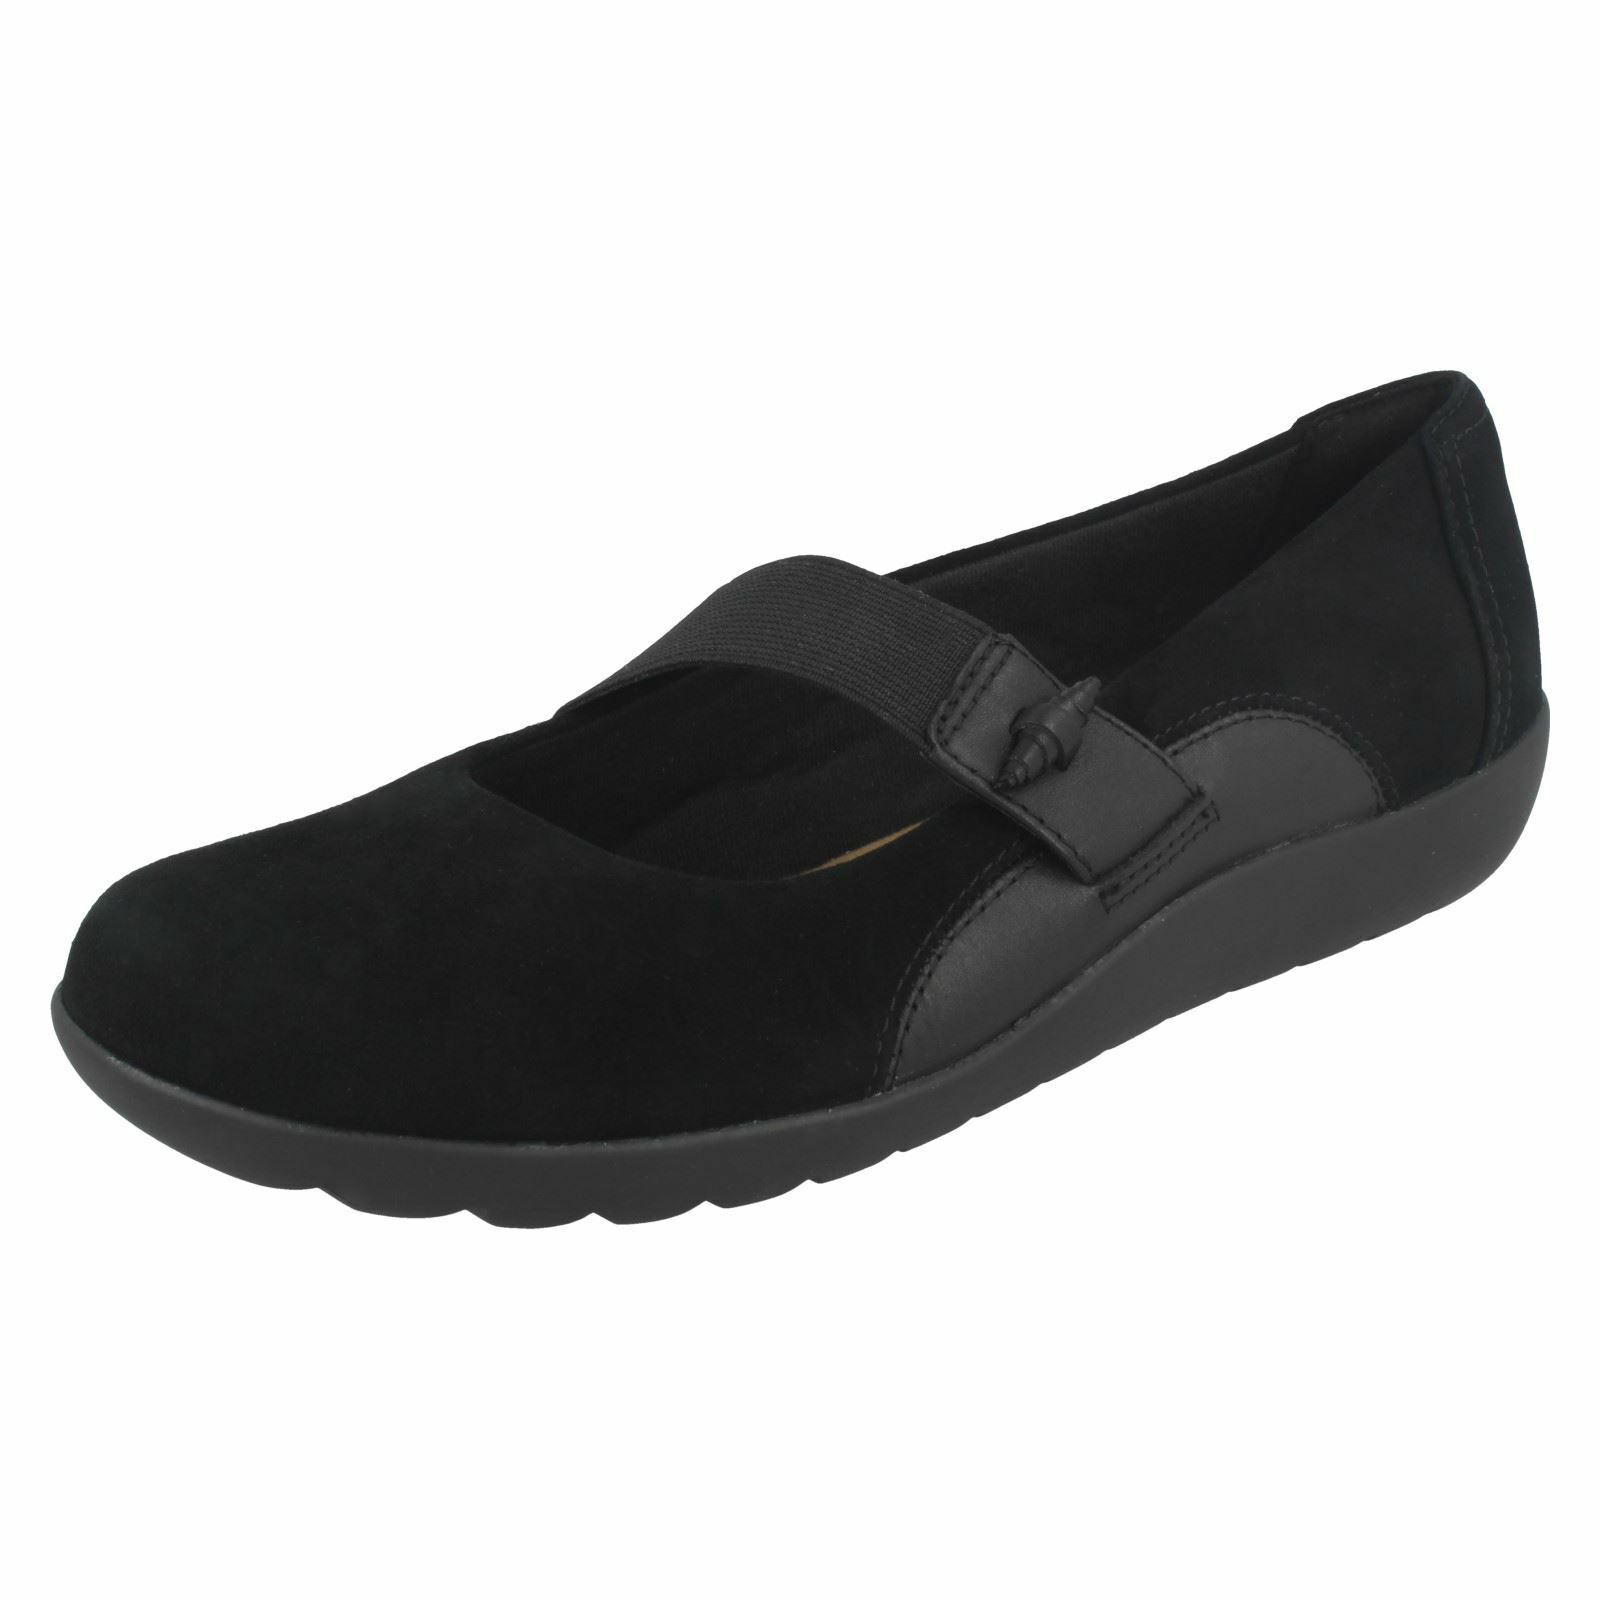 Clarks Femmes Élastique Sangle Chaussures  Medora FROST